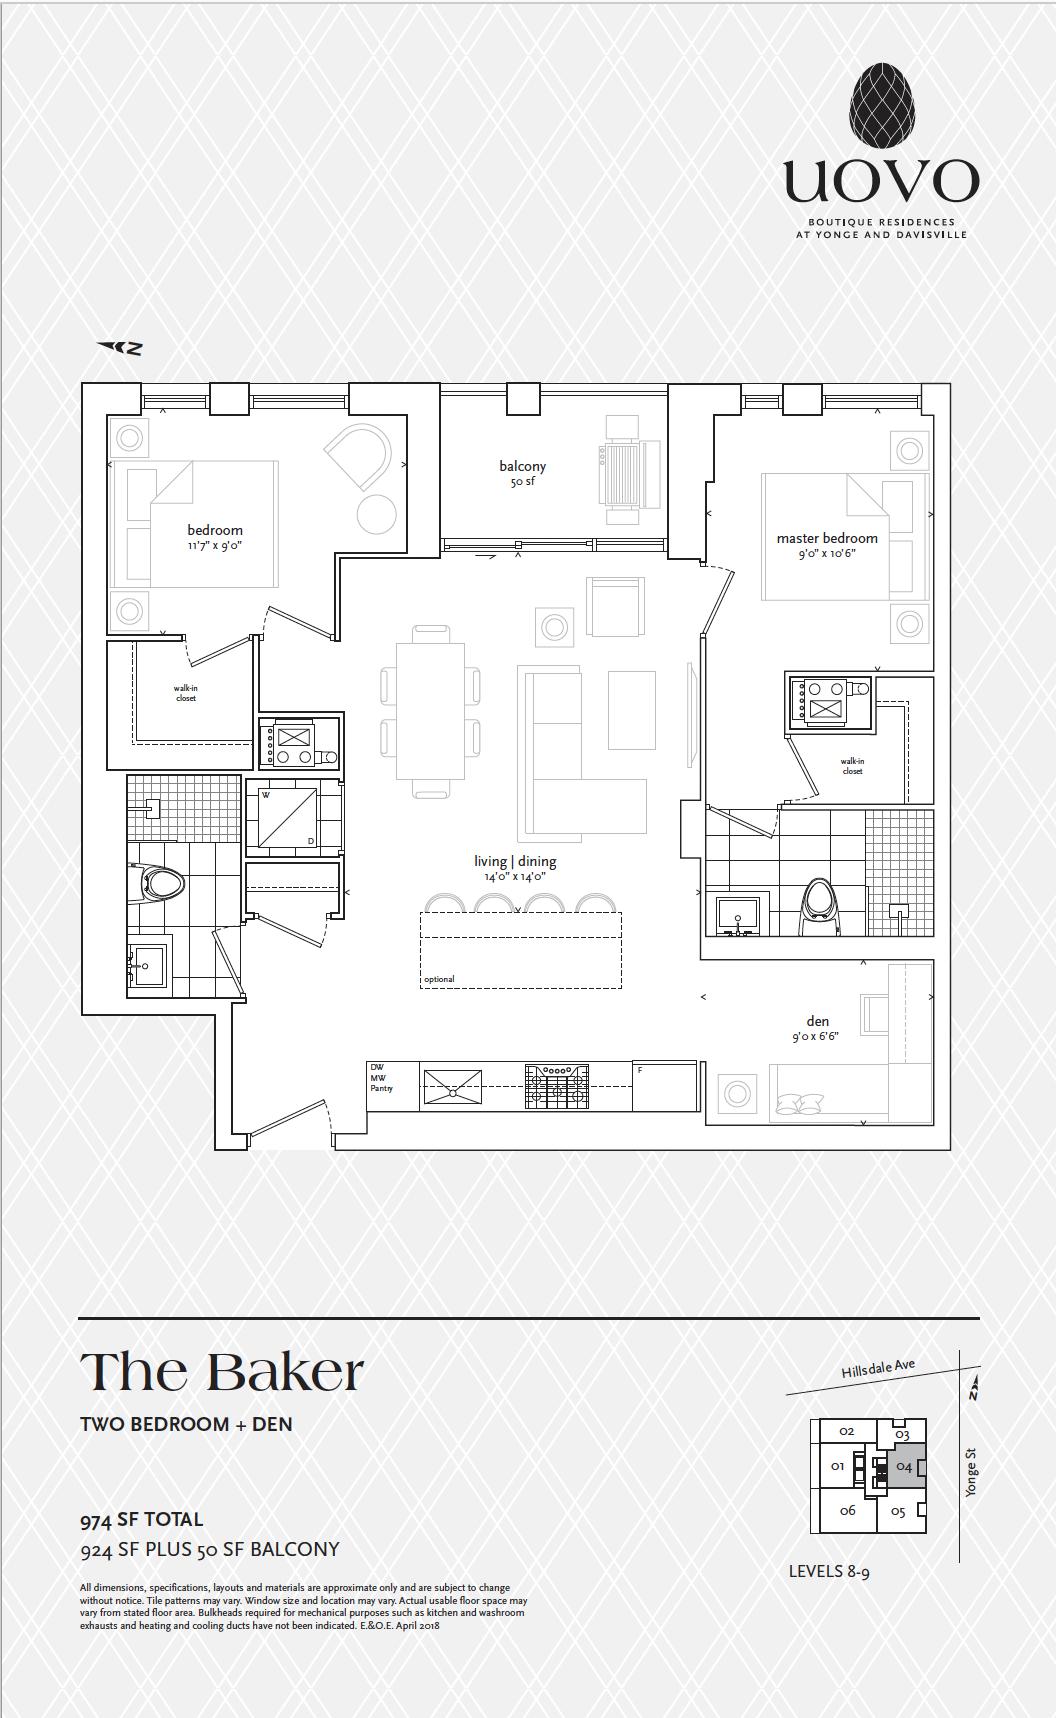 The Baker - Uovo Residences